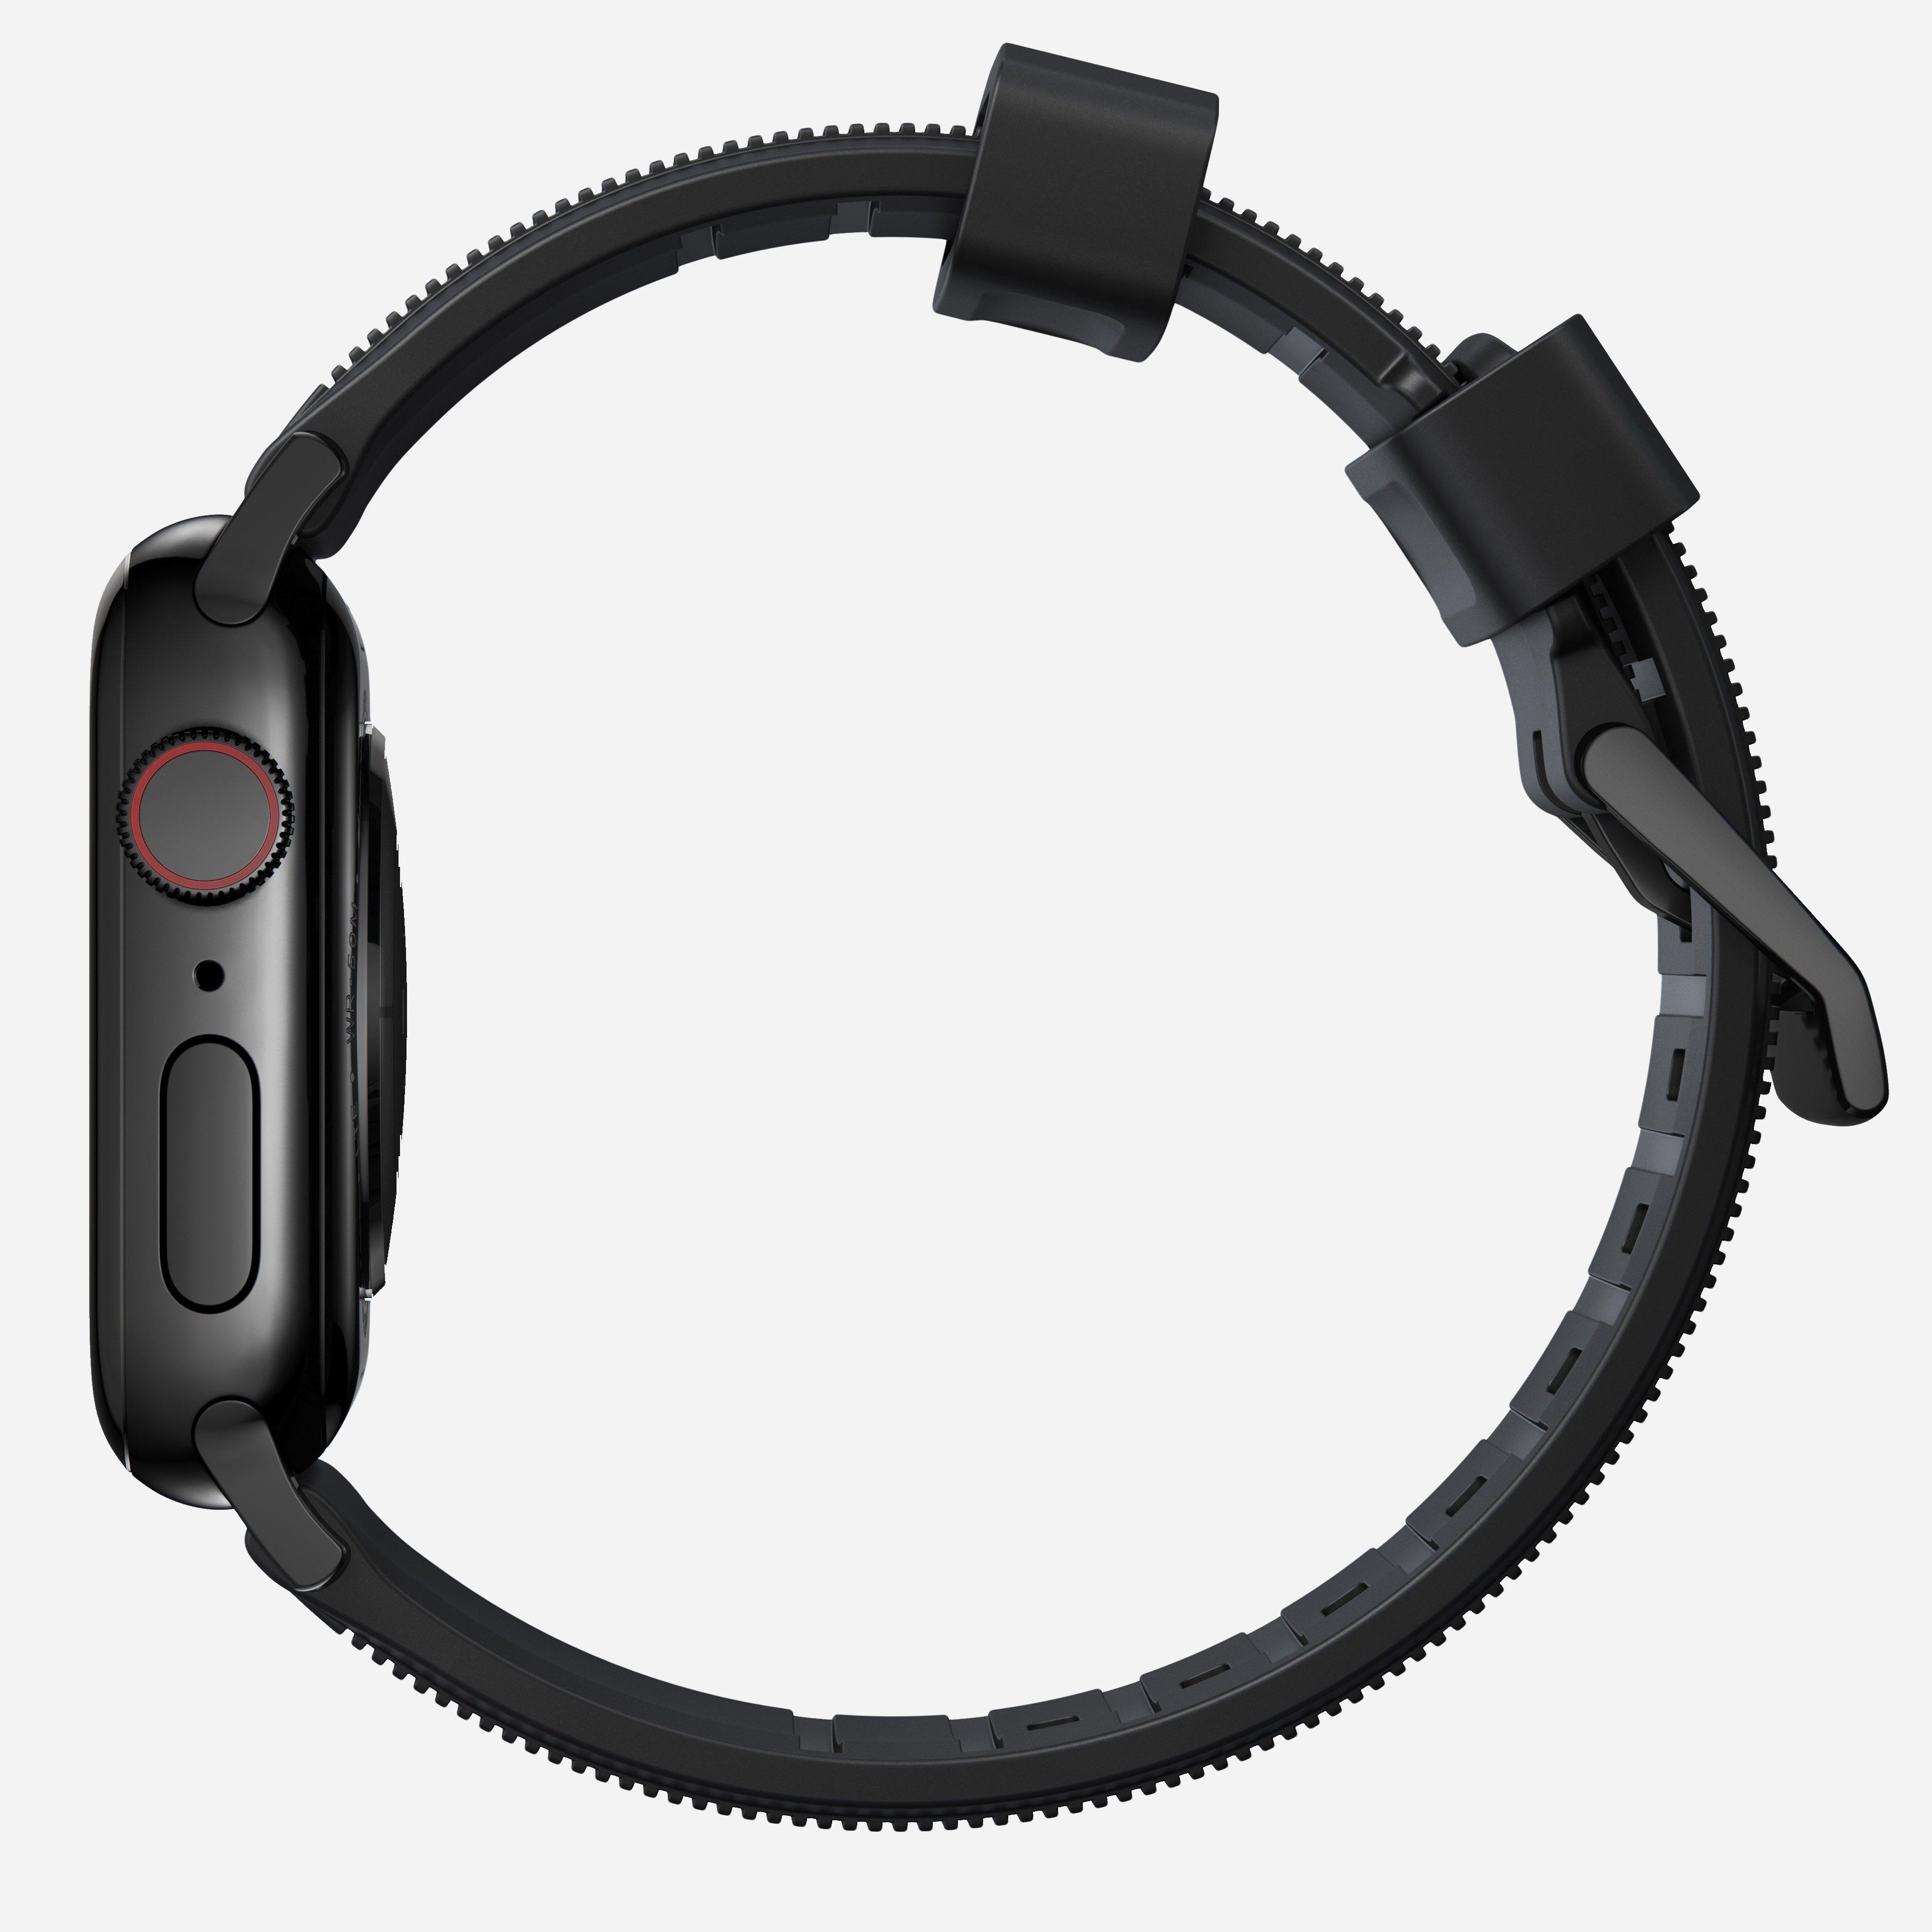 Rugged strap black hardware